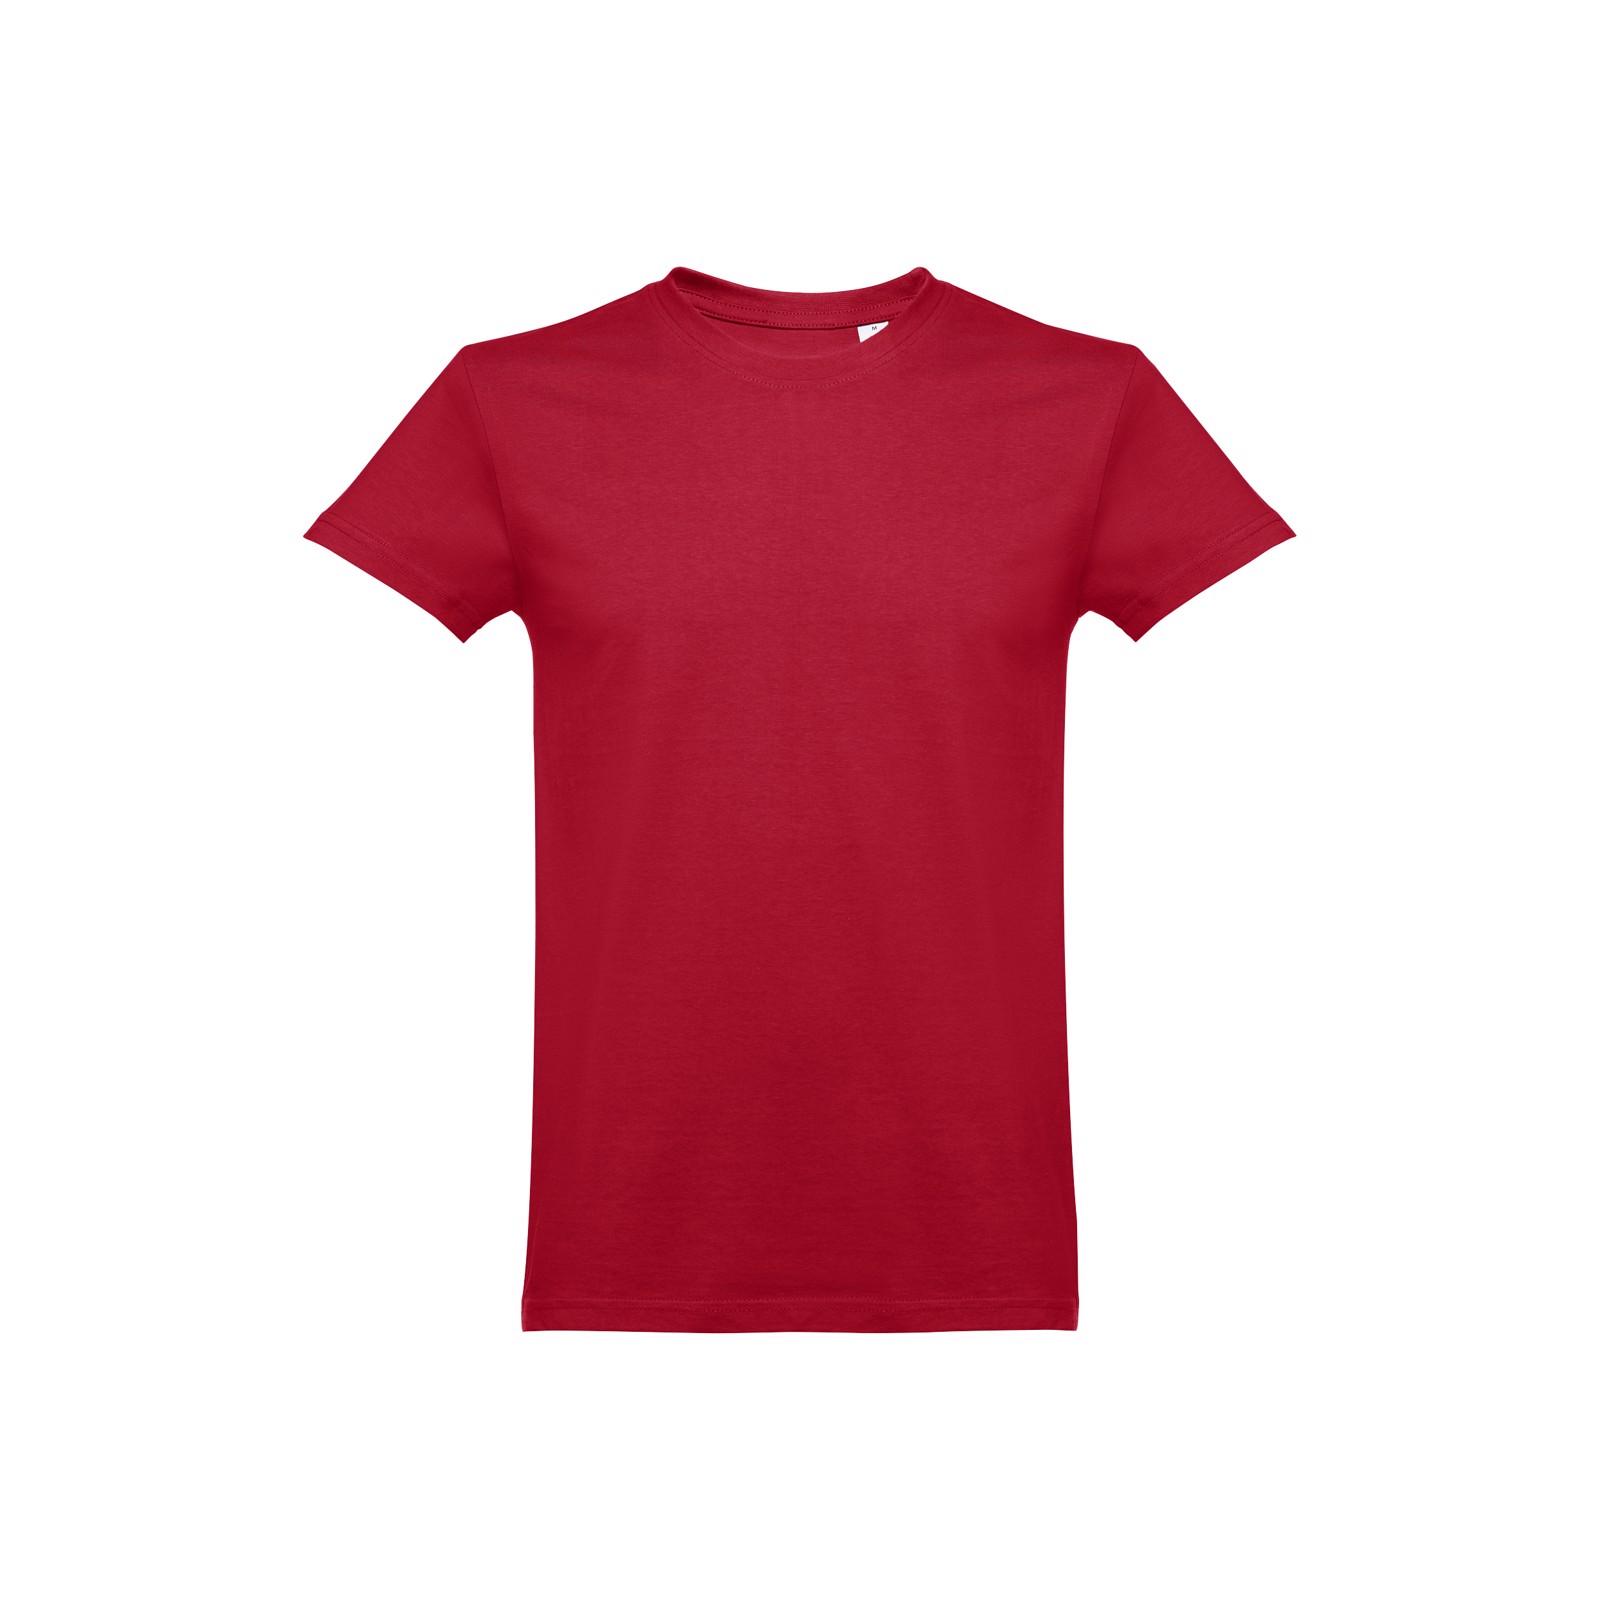 ANKARA. Pánské tričko - Bordó / M